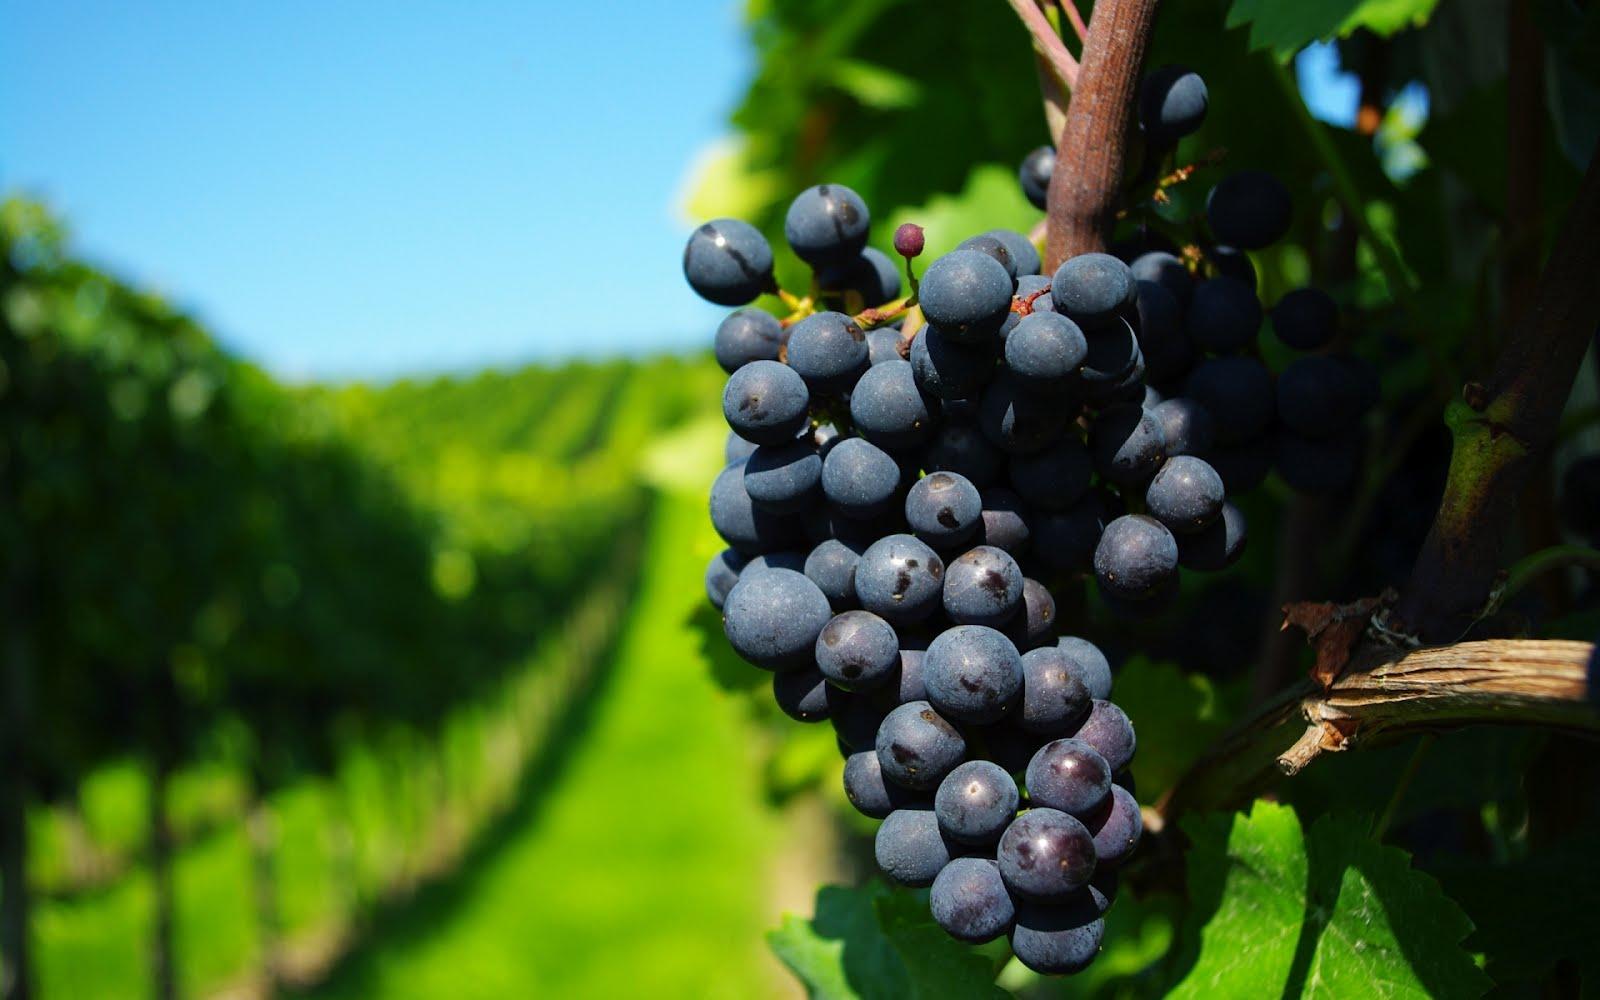 http://2.bp.blogspot.com/-gKEglJUwqlc/T0MMalHagrI/AAAAAAAAxA4/HG2YNCo08D4/s1600/ripe-grapes-1920x1200-wallpaper-racimo-de-uvas-en-el-vi%25C3%25B1edo.jpg